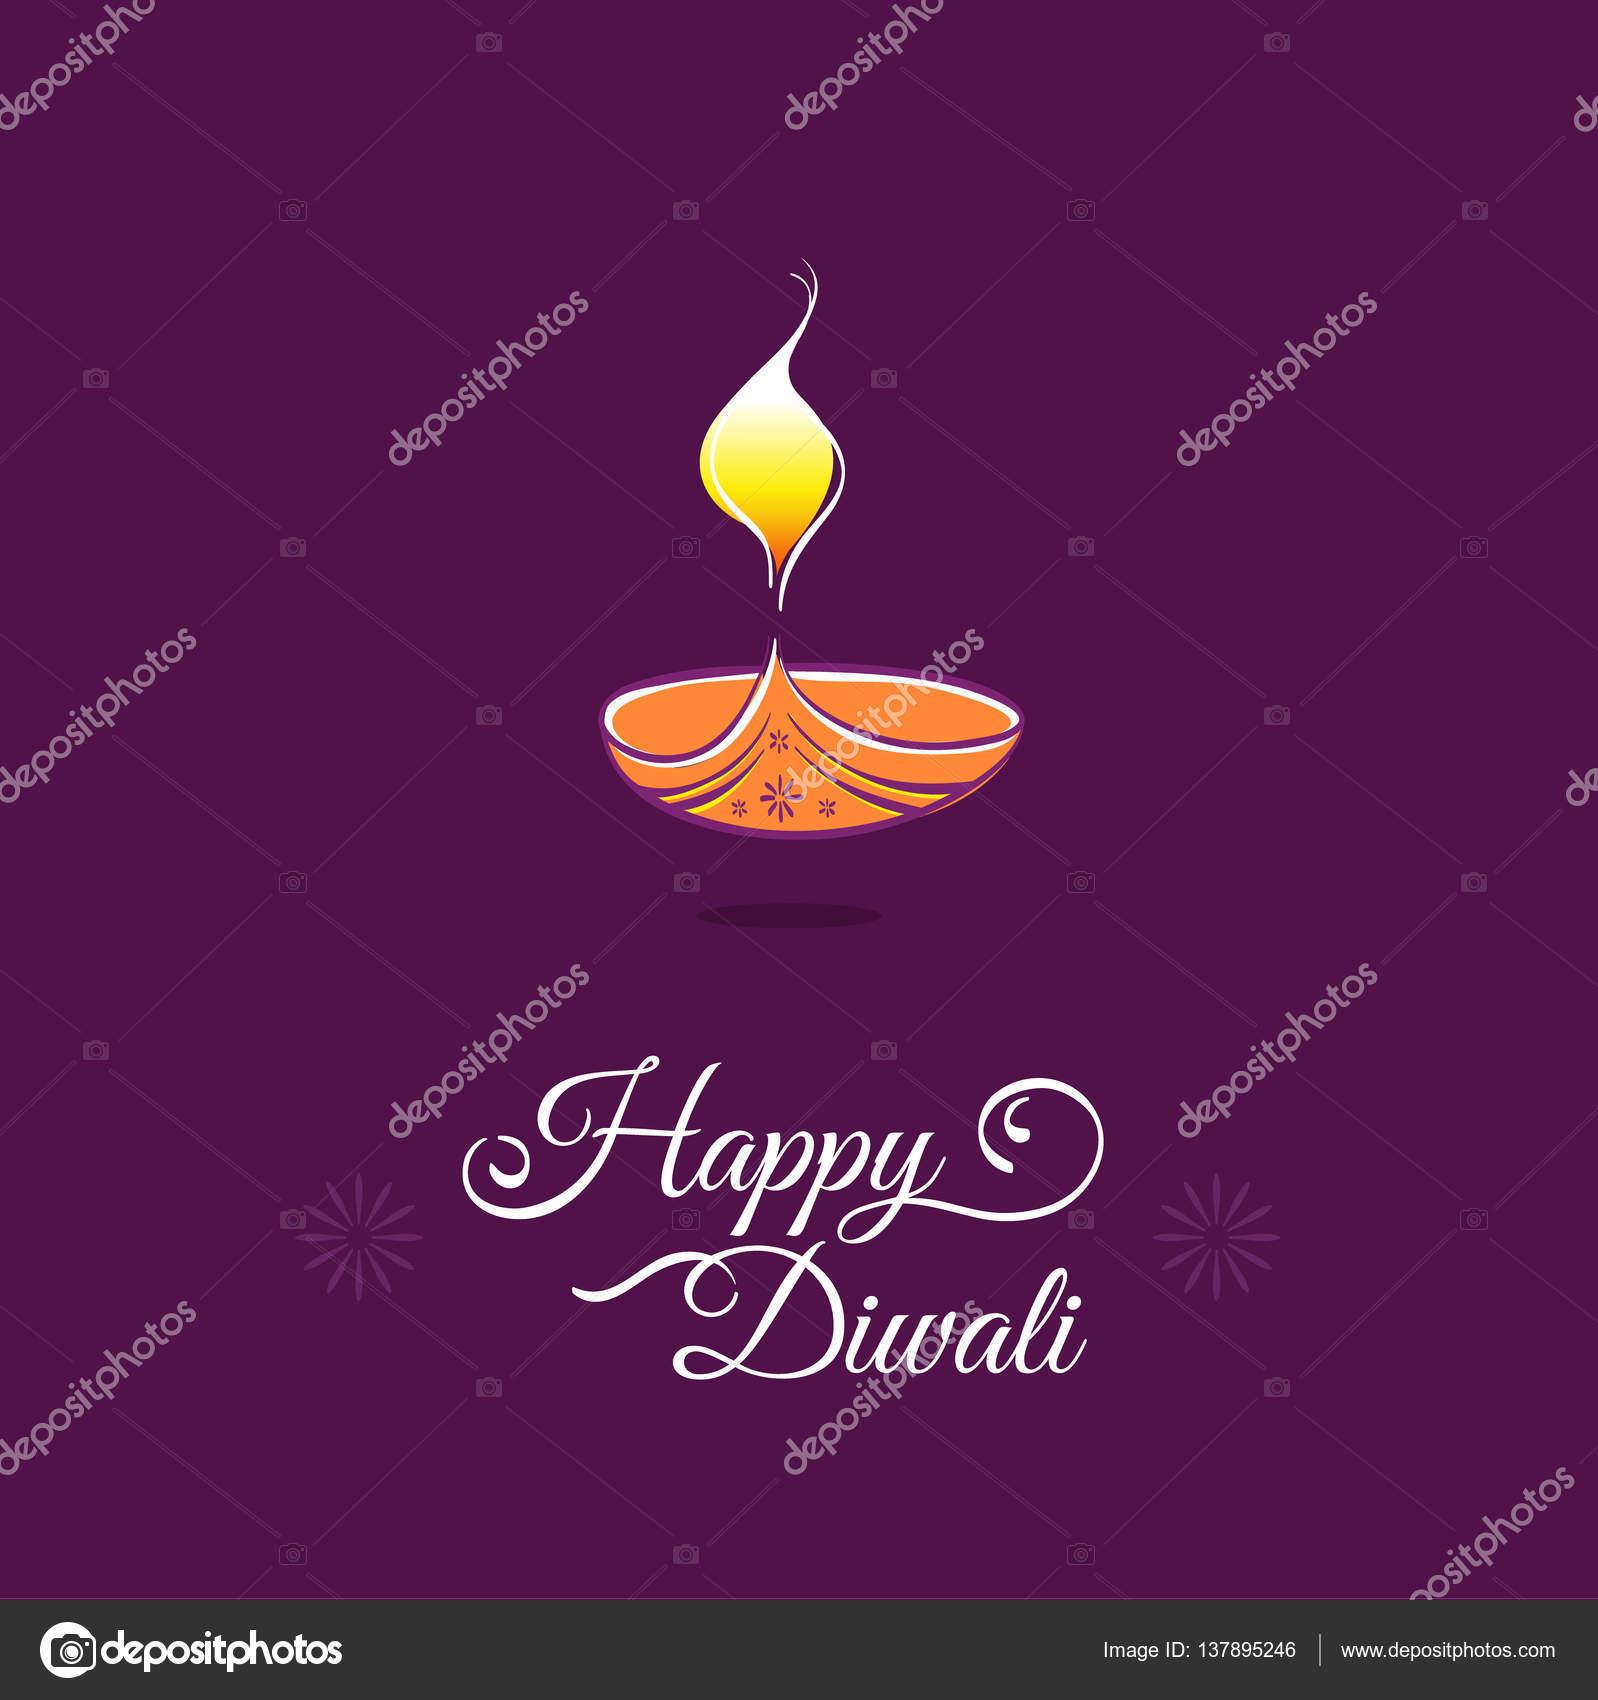 Diwali greeting card stock vector puruan 137895246 diwali greeting card template happy deepavali indian festival lights vector by puruan kristyandbryce Gallery